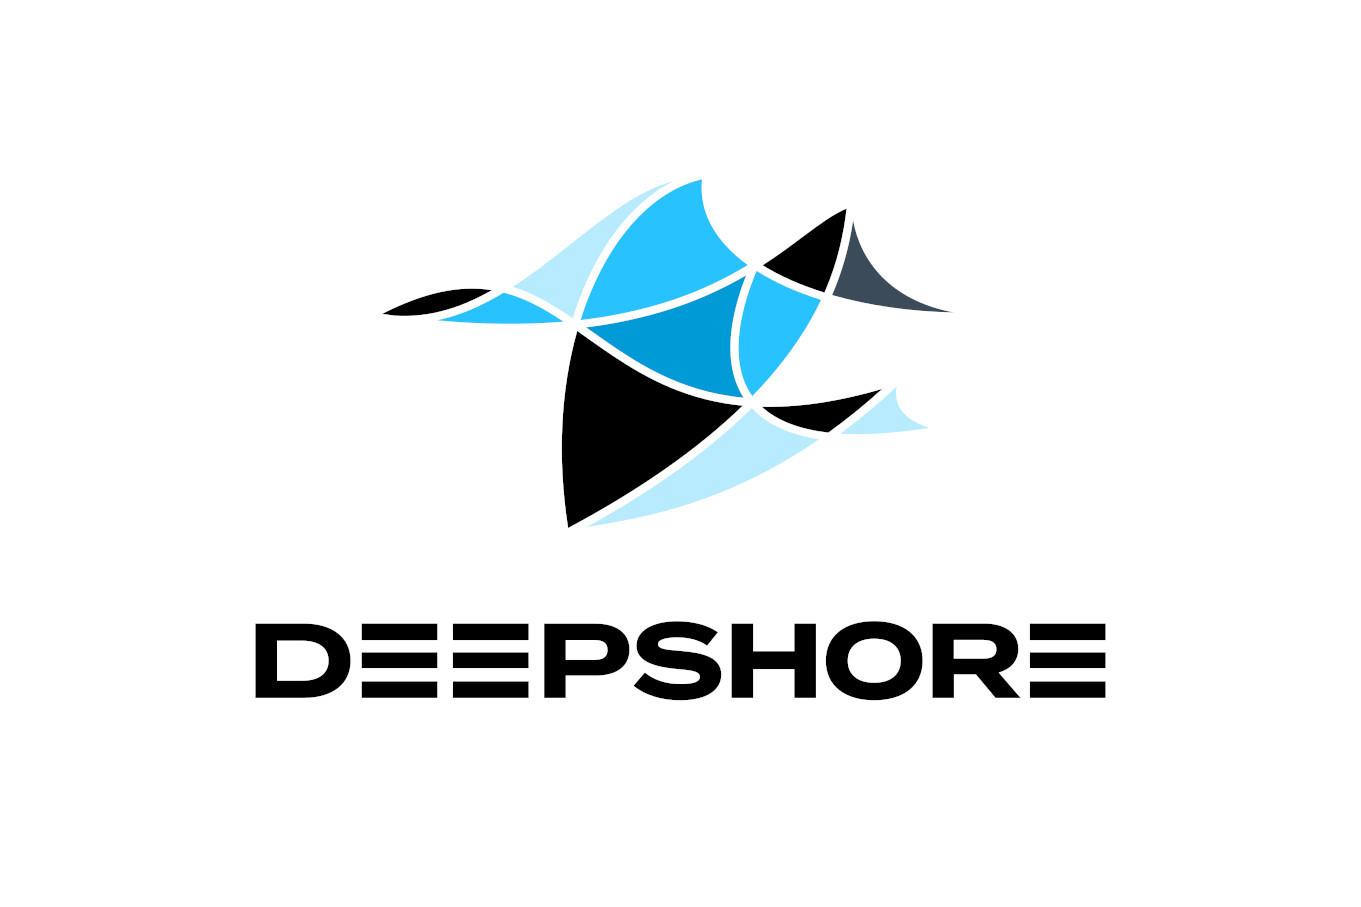 Deepshore GmbH